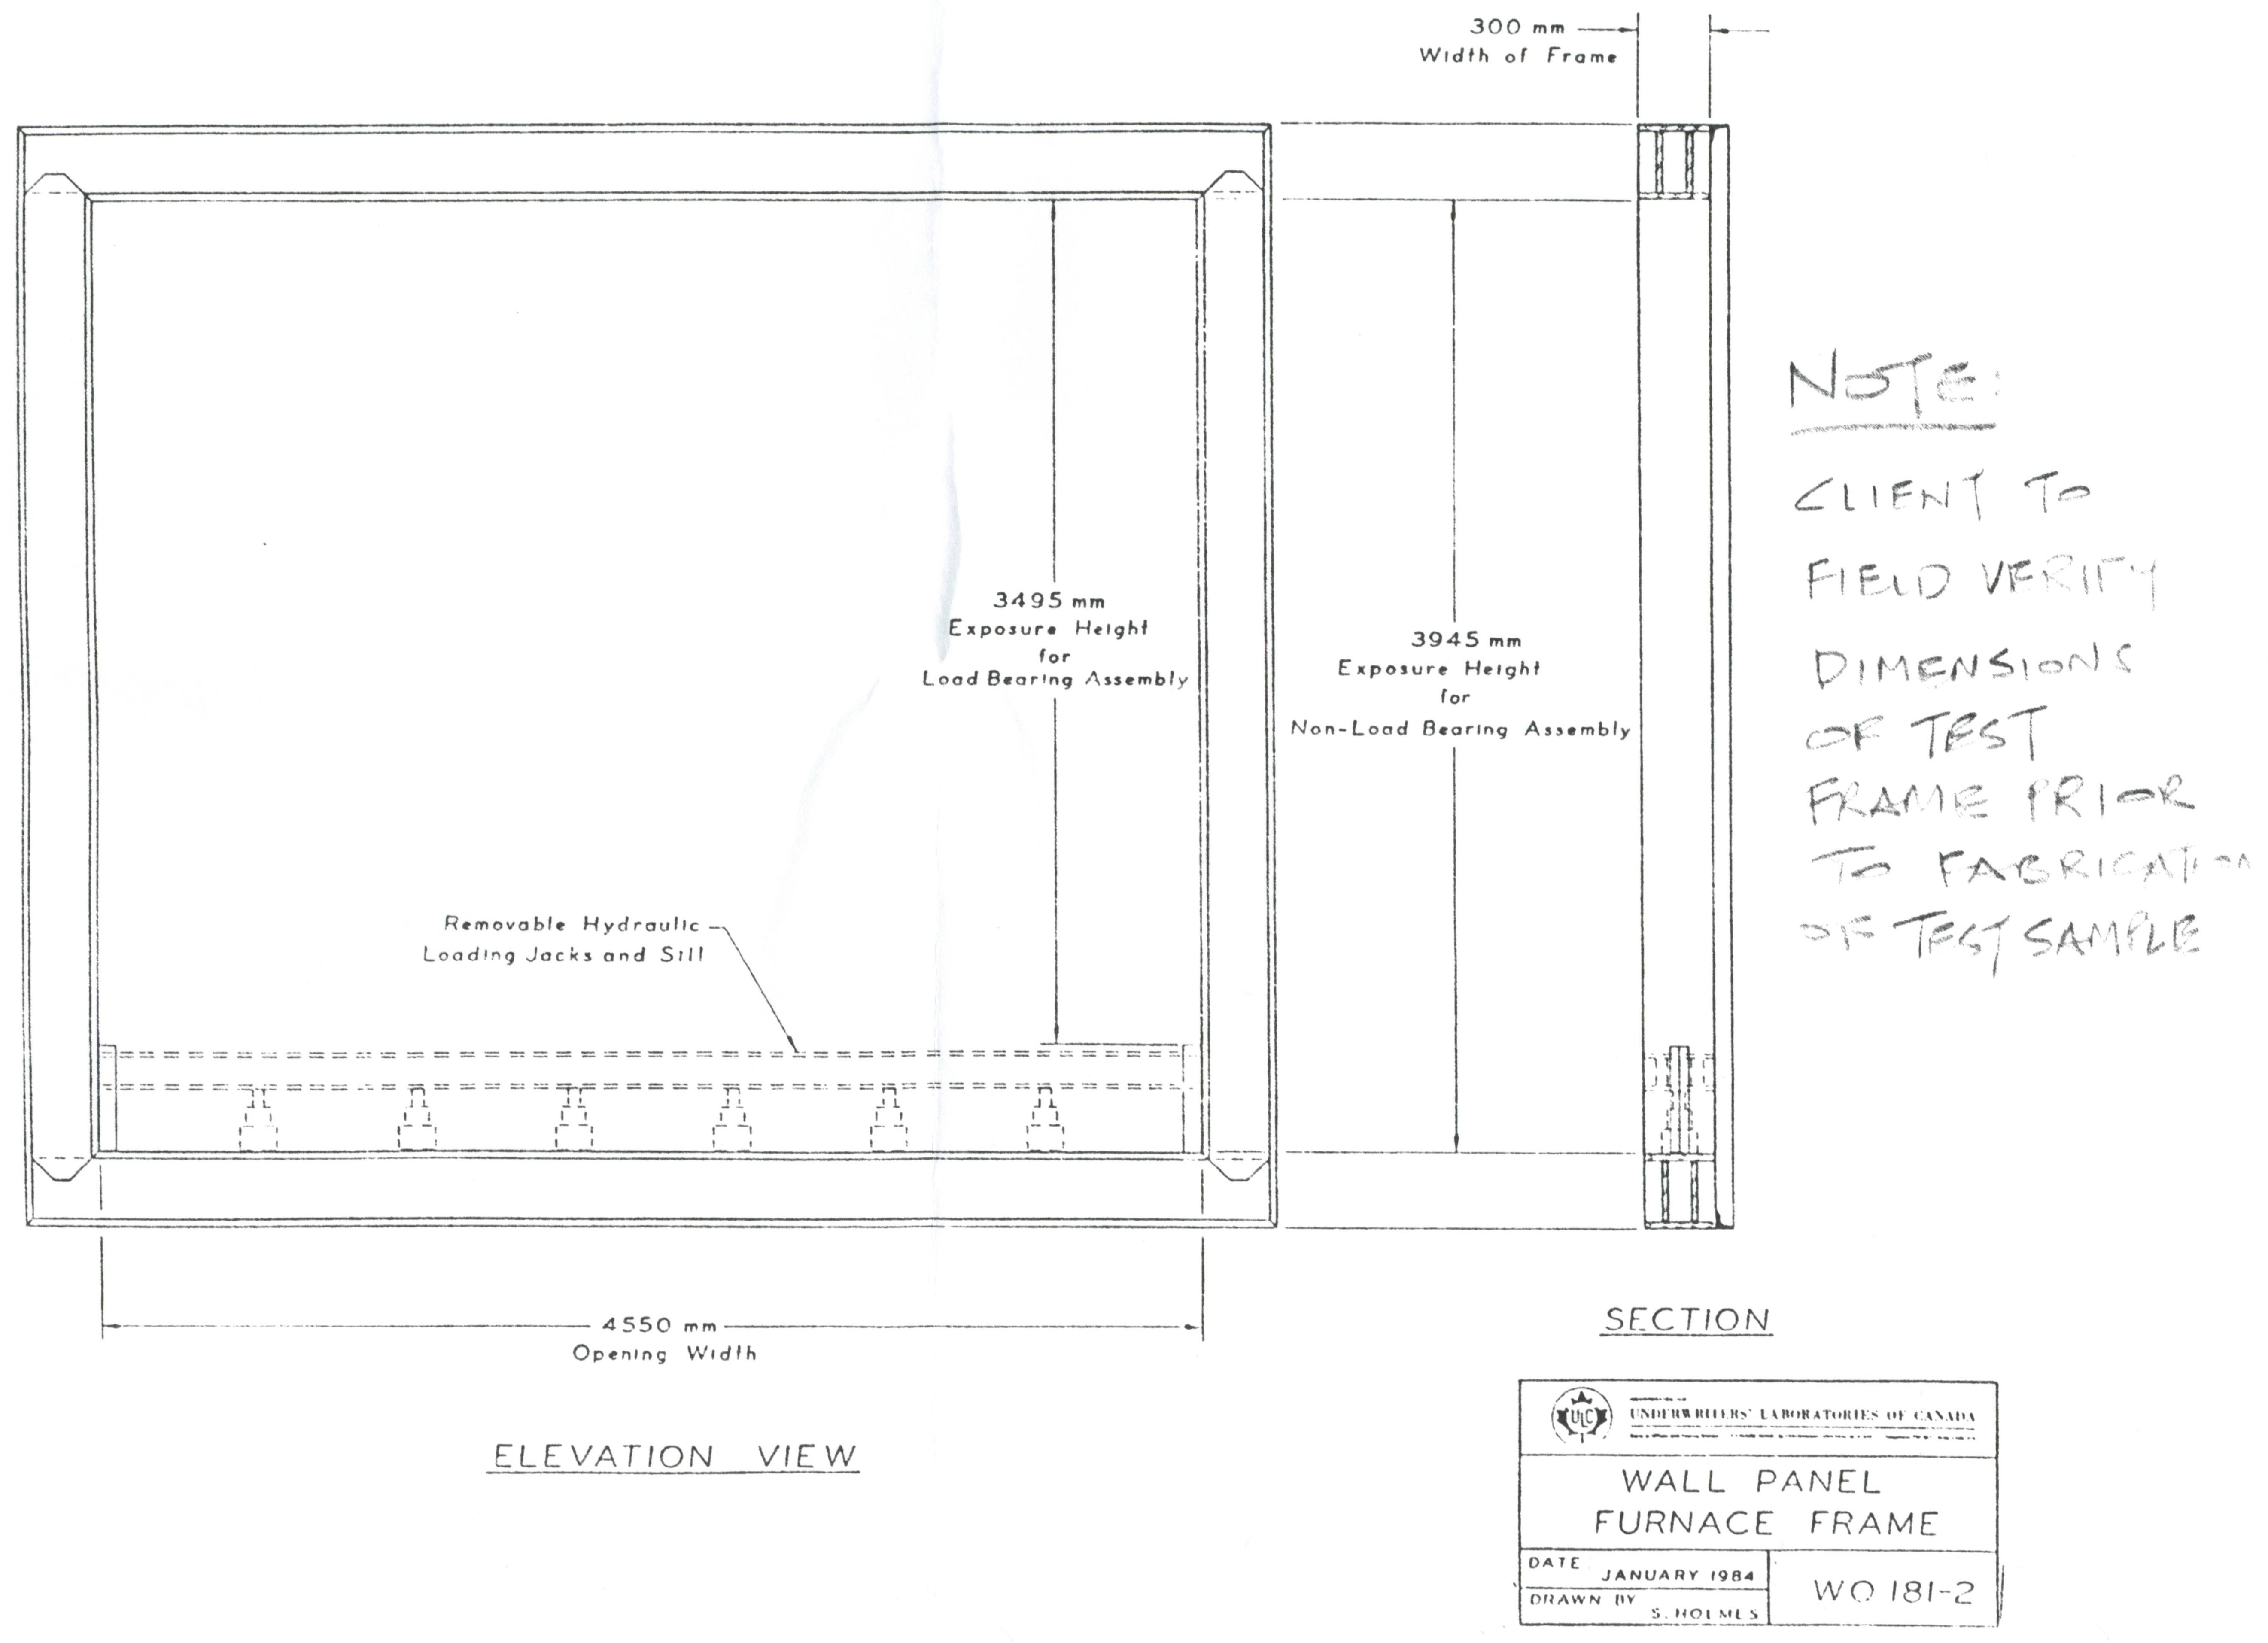 File Ulc Wall Panel Furnace Frame Drawing Jpg